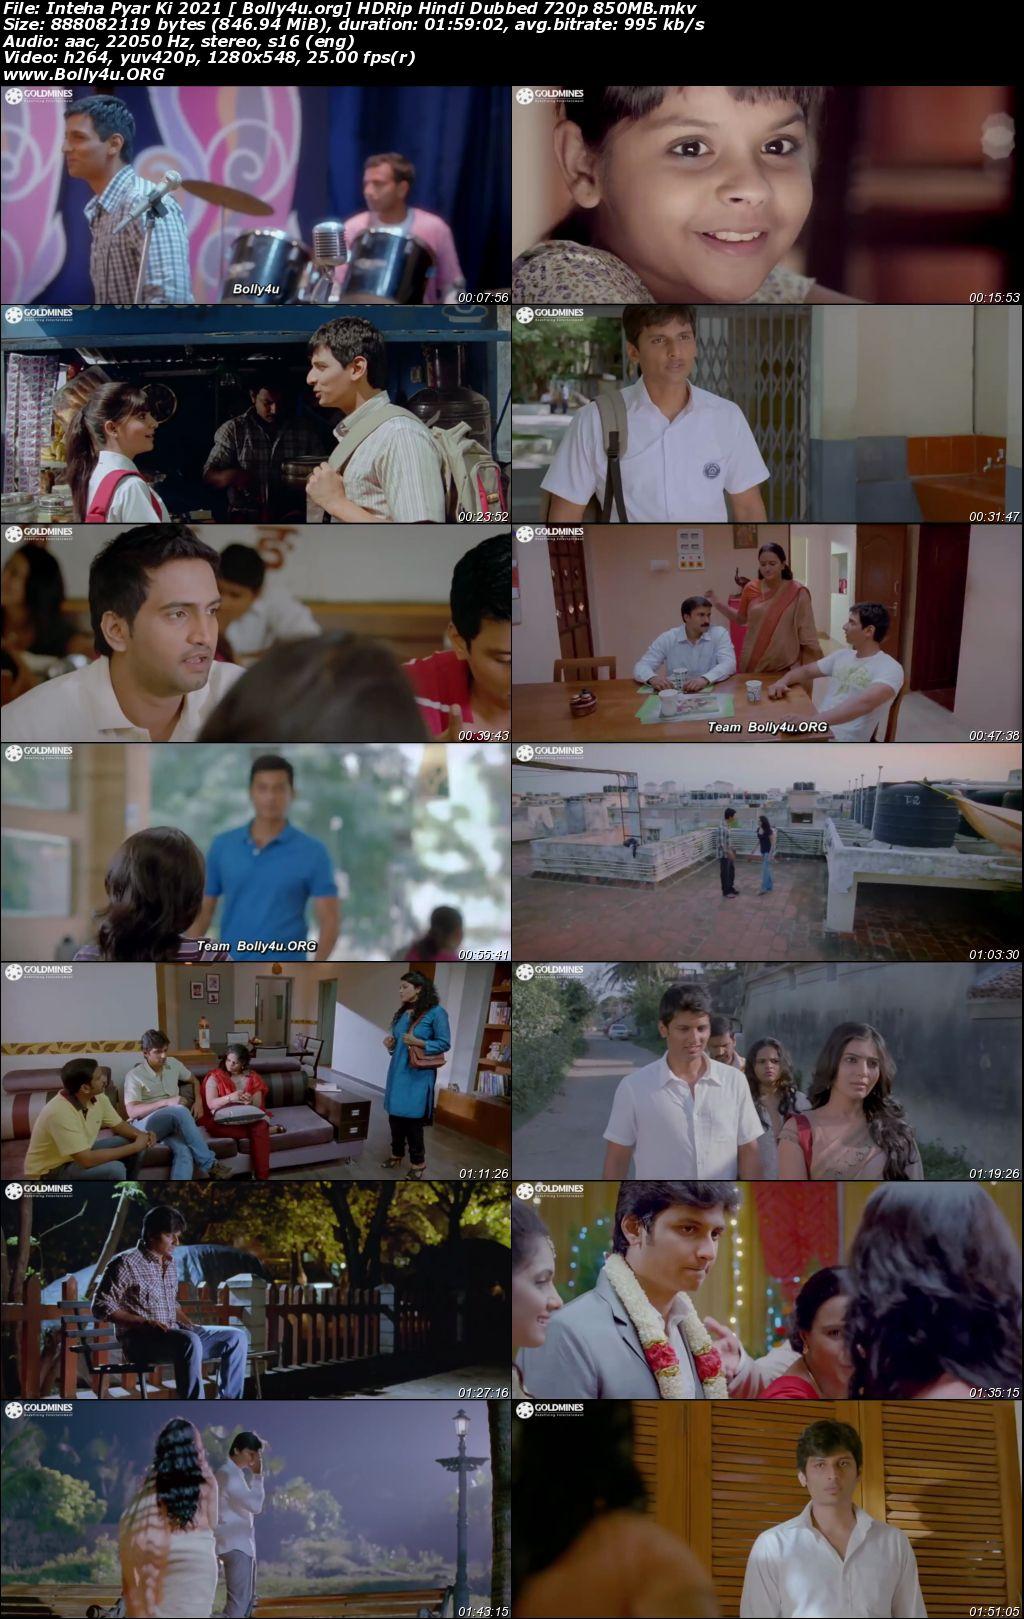 Inteha Pyar Ki 2021 HDRip 850MB Hindi Dubbed 720p Download